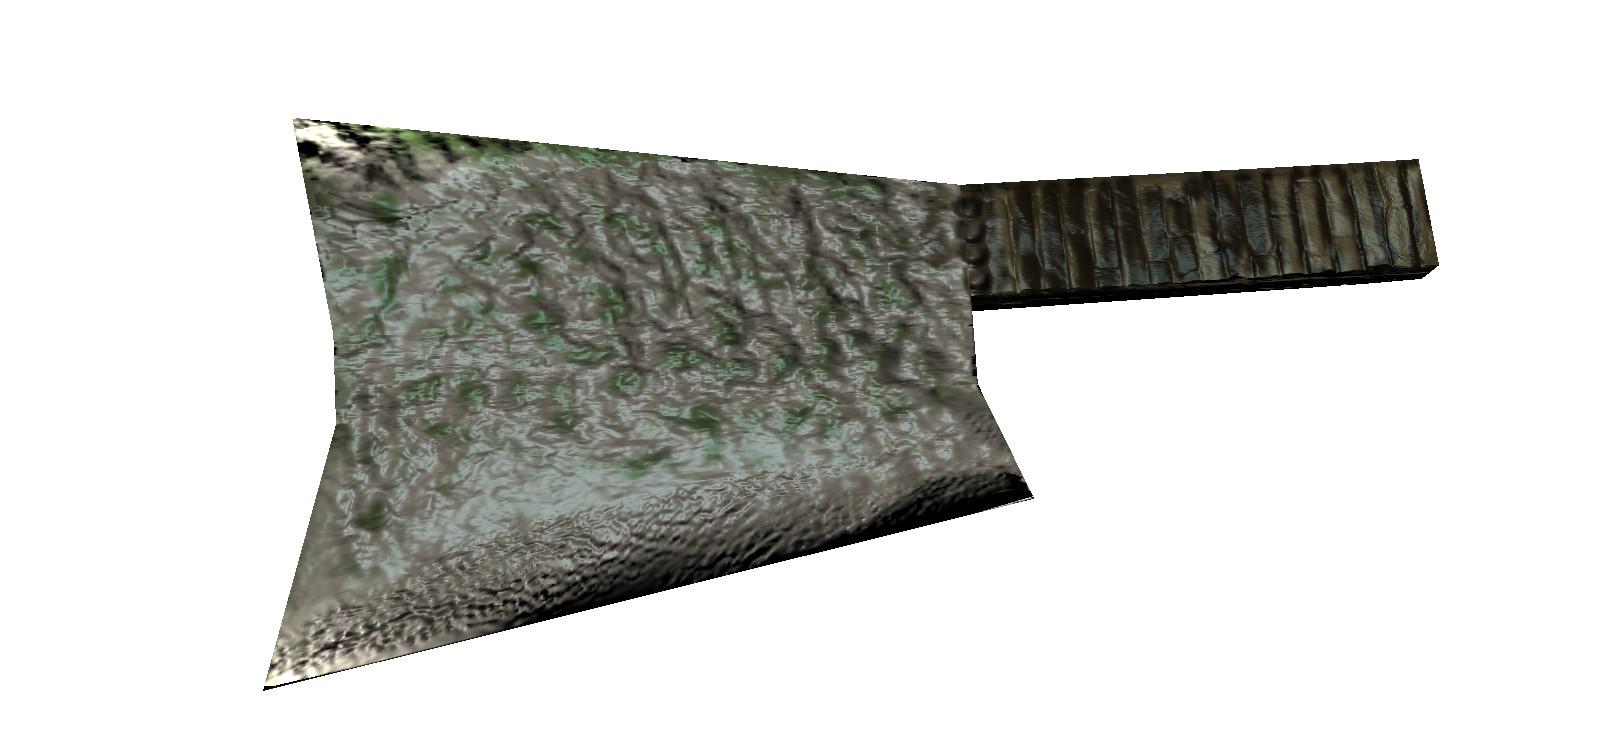 GoblinKnife